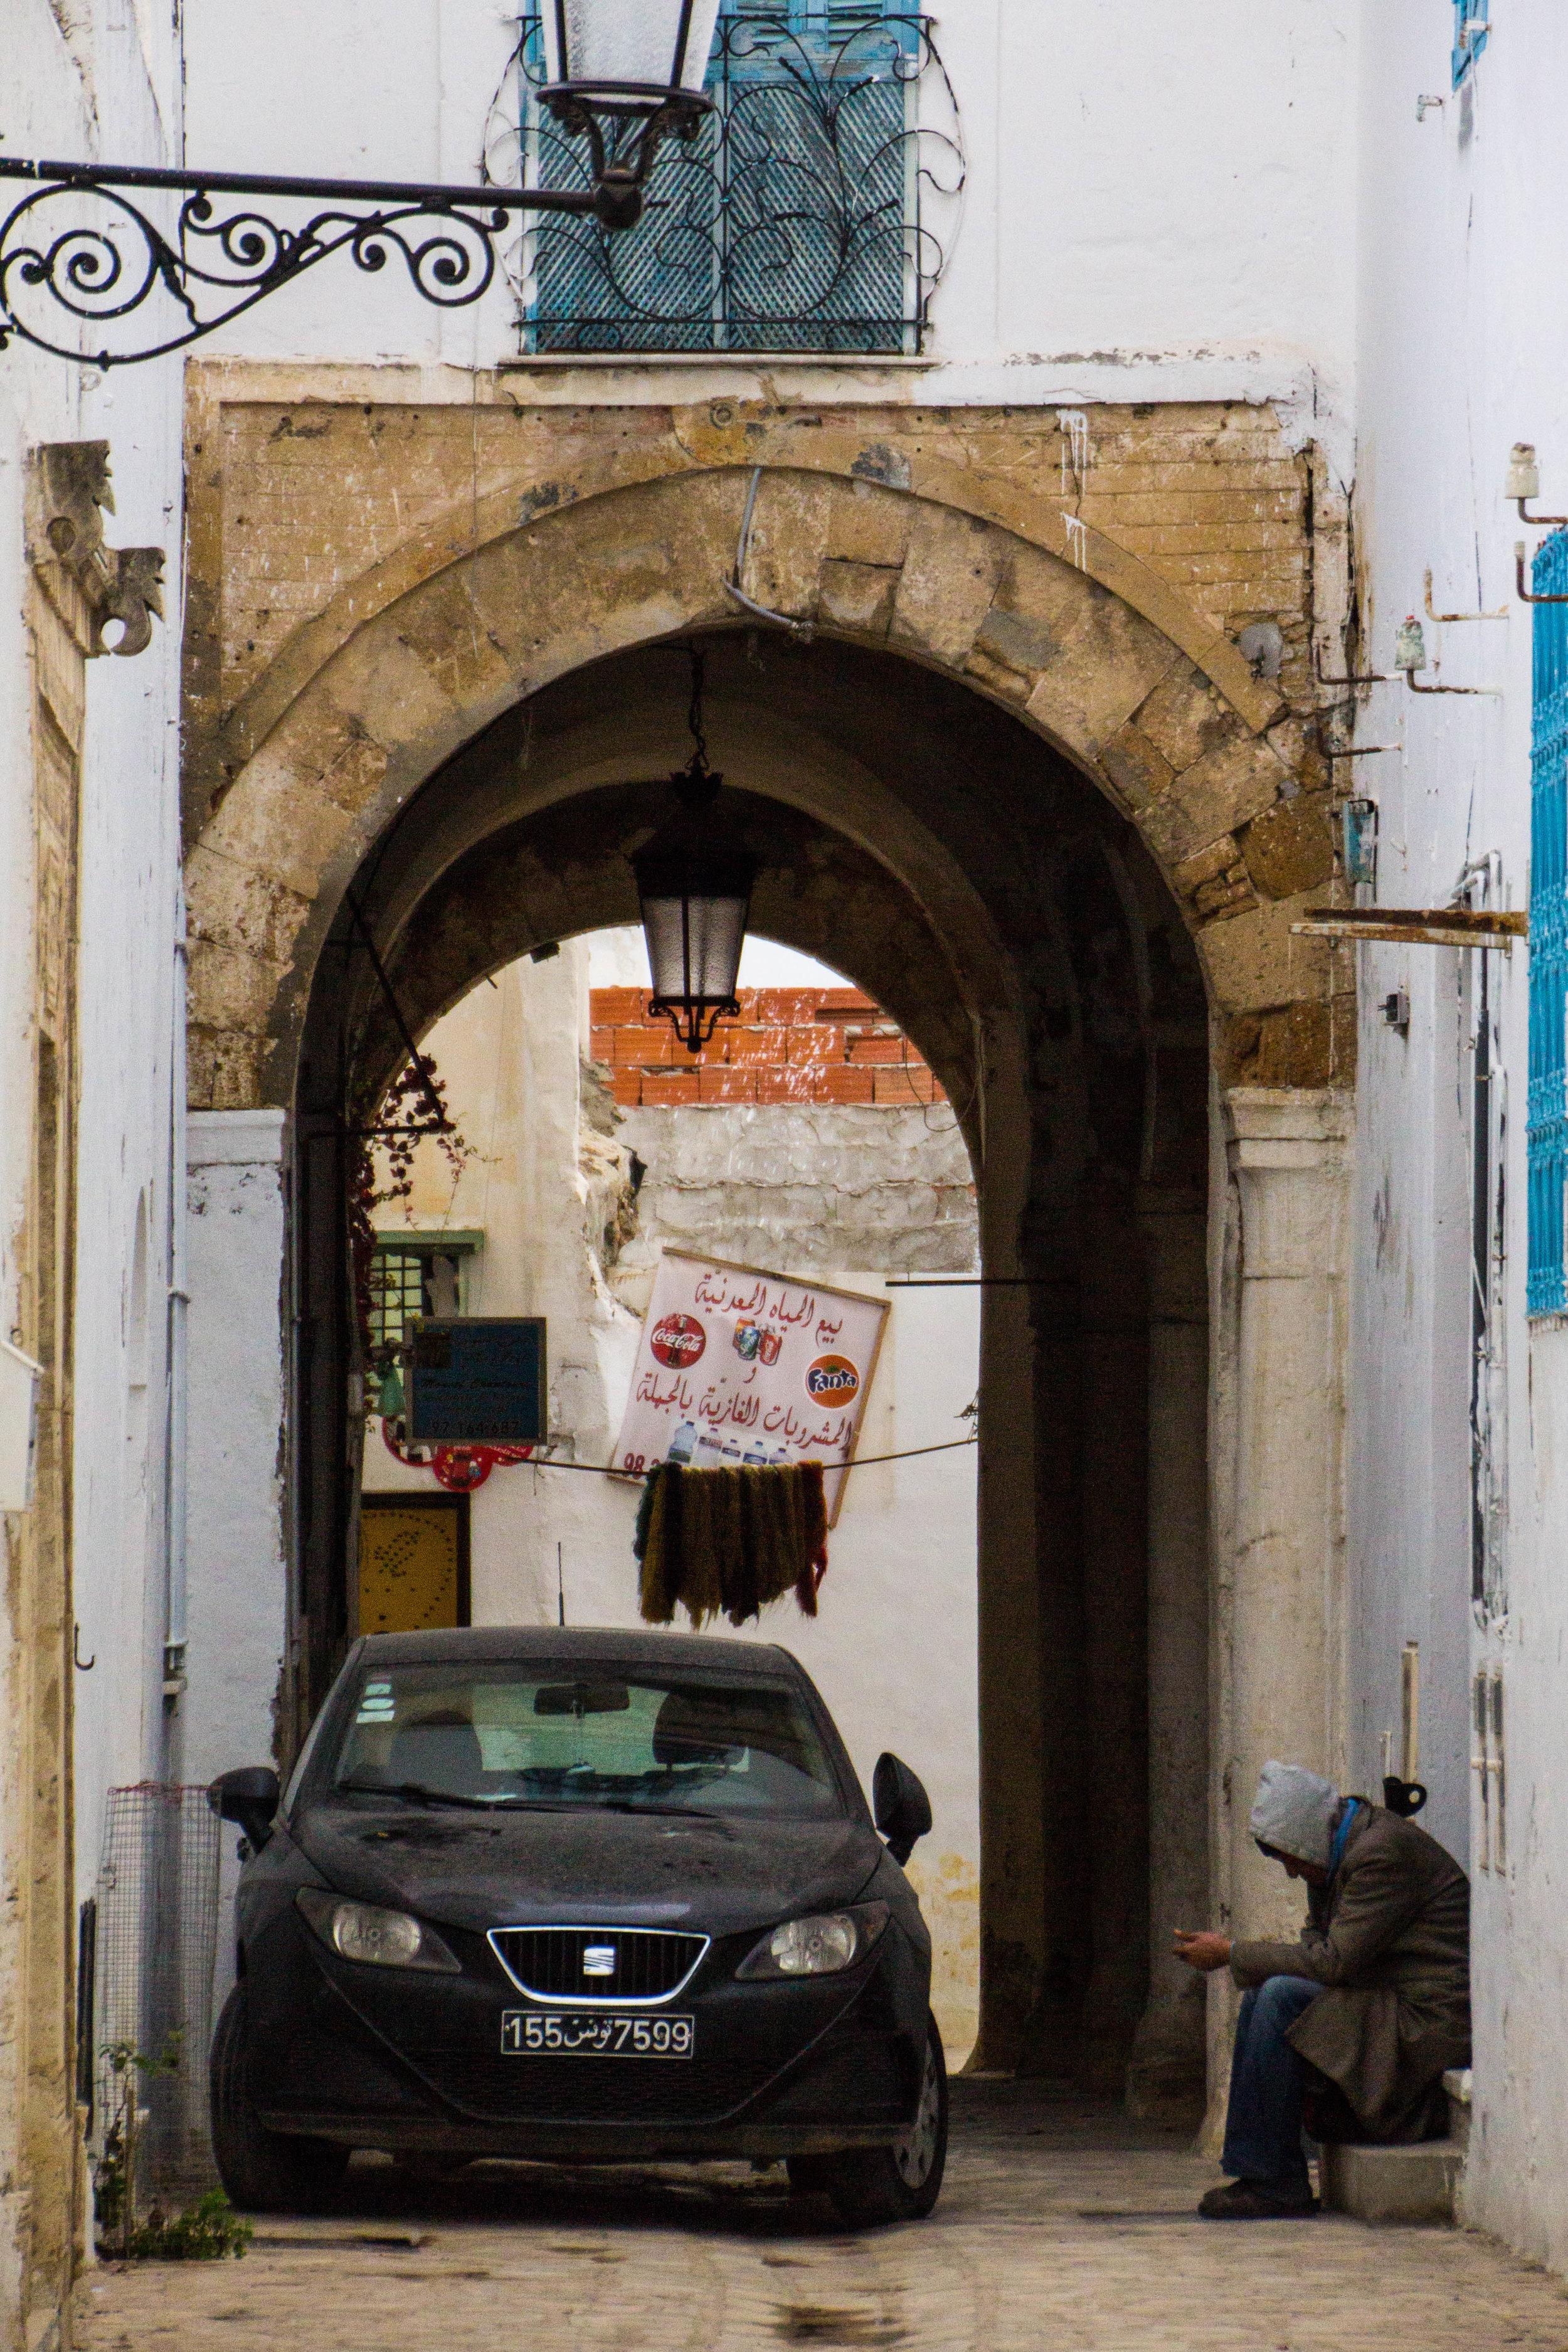 medina-photography-tunis-tunisia-40.jpg